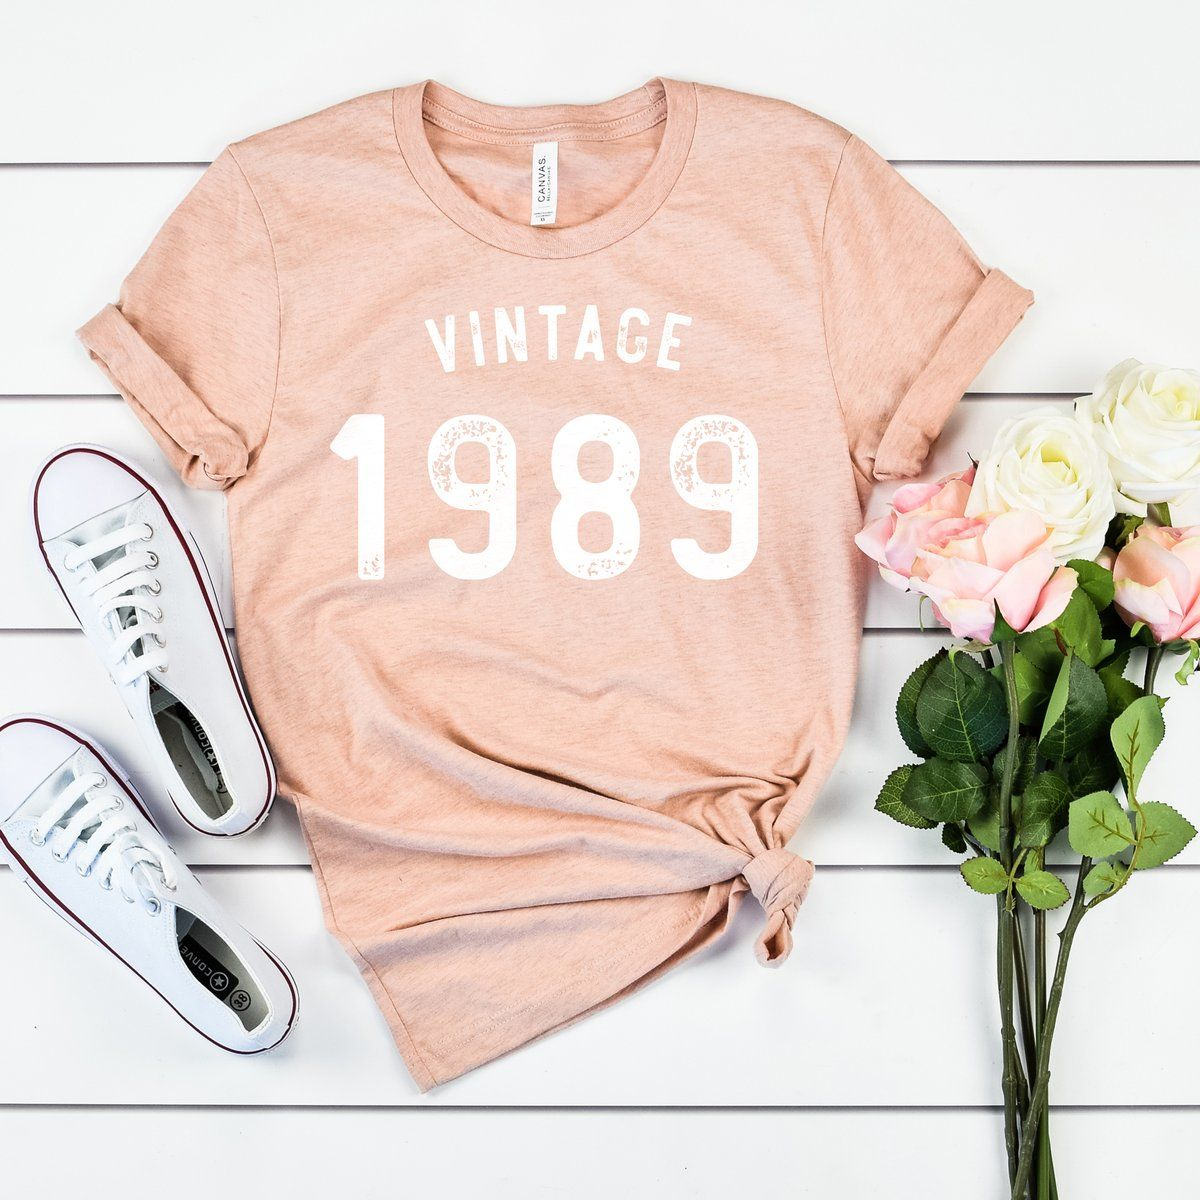 Vintage 1989 30th Birthday Shirt Playera De Cumpleaños 40 Cumpleaños Mujer Cumpleaños Mujer